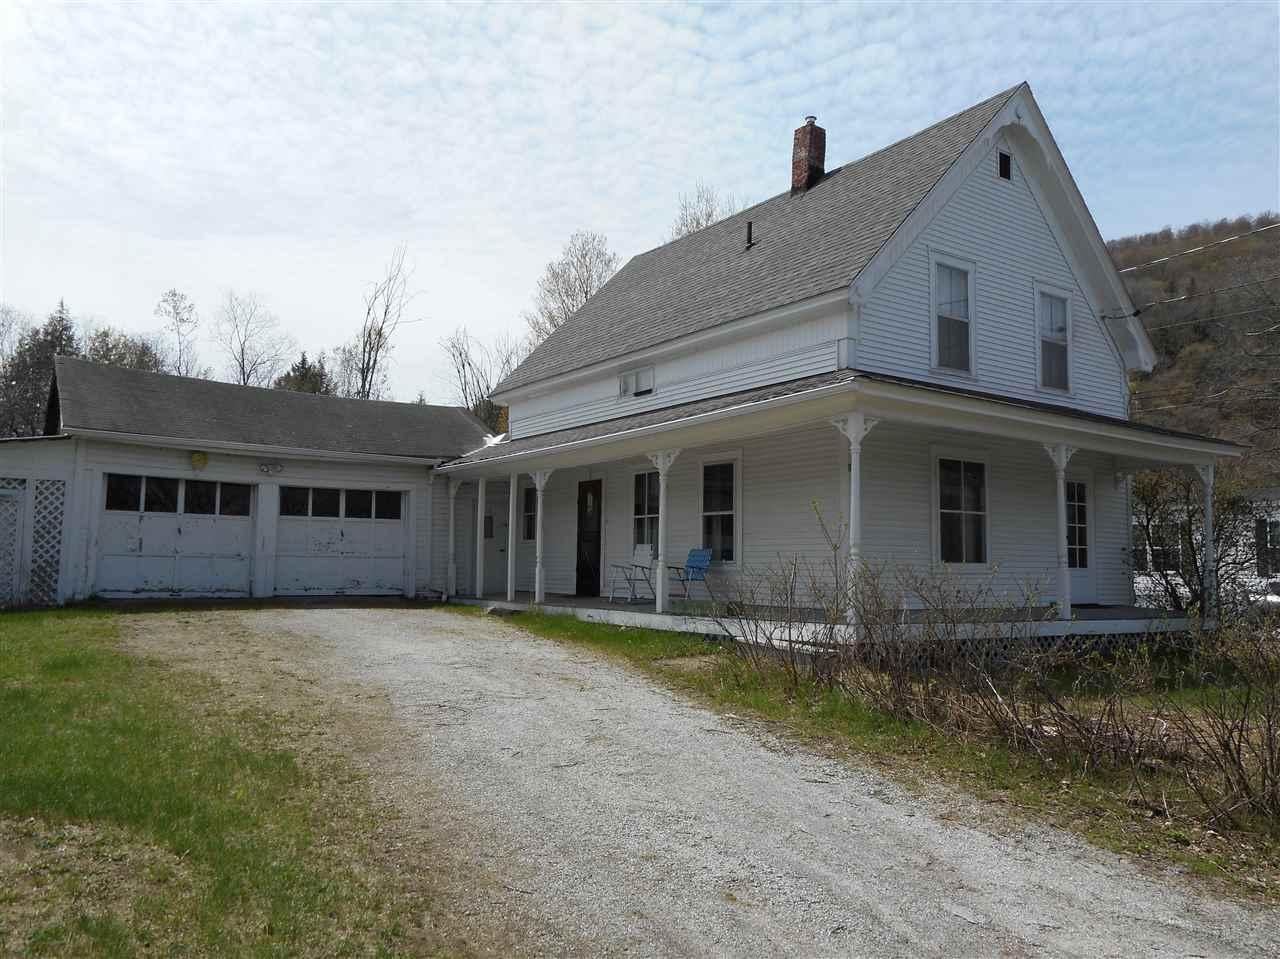 Vermont-Real-Estate-4622263-0